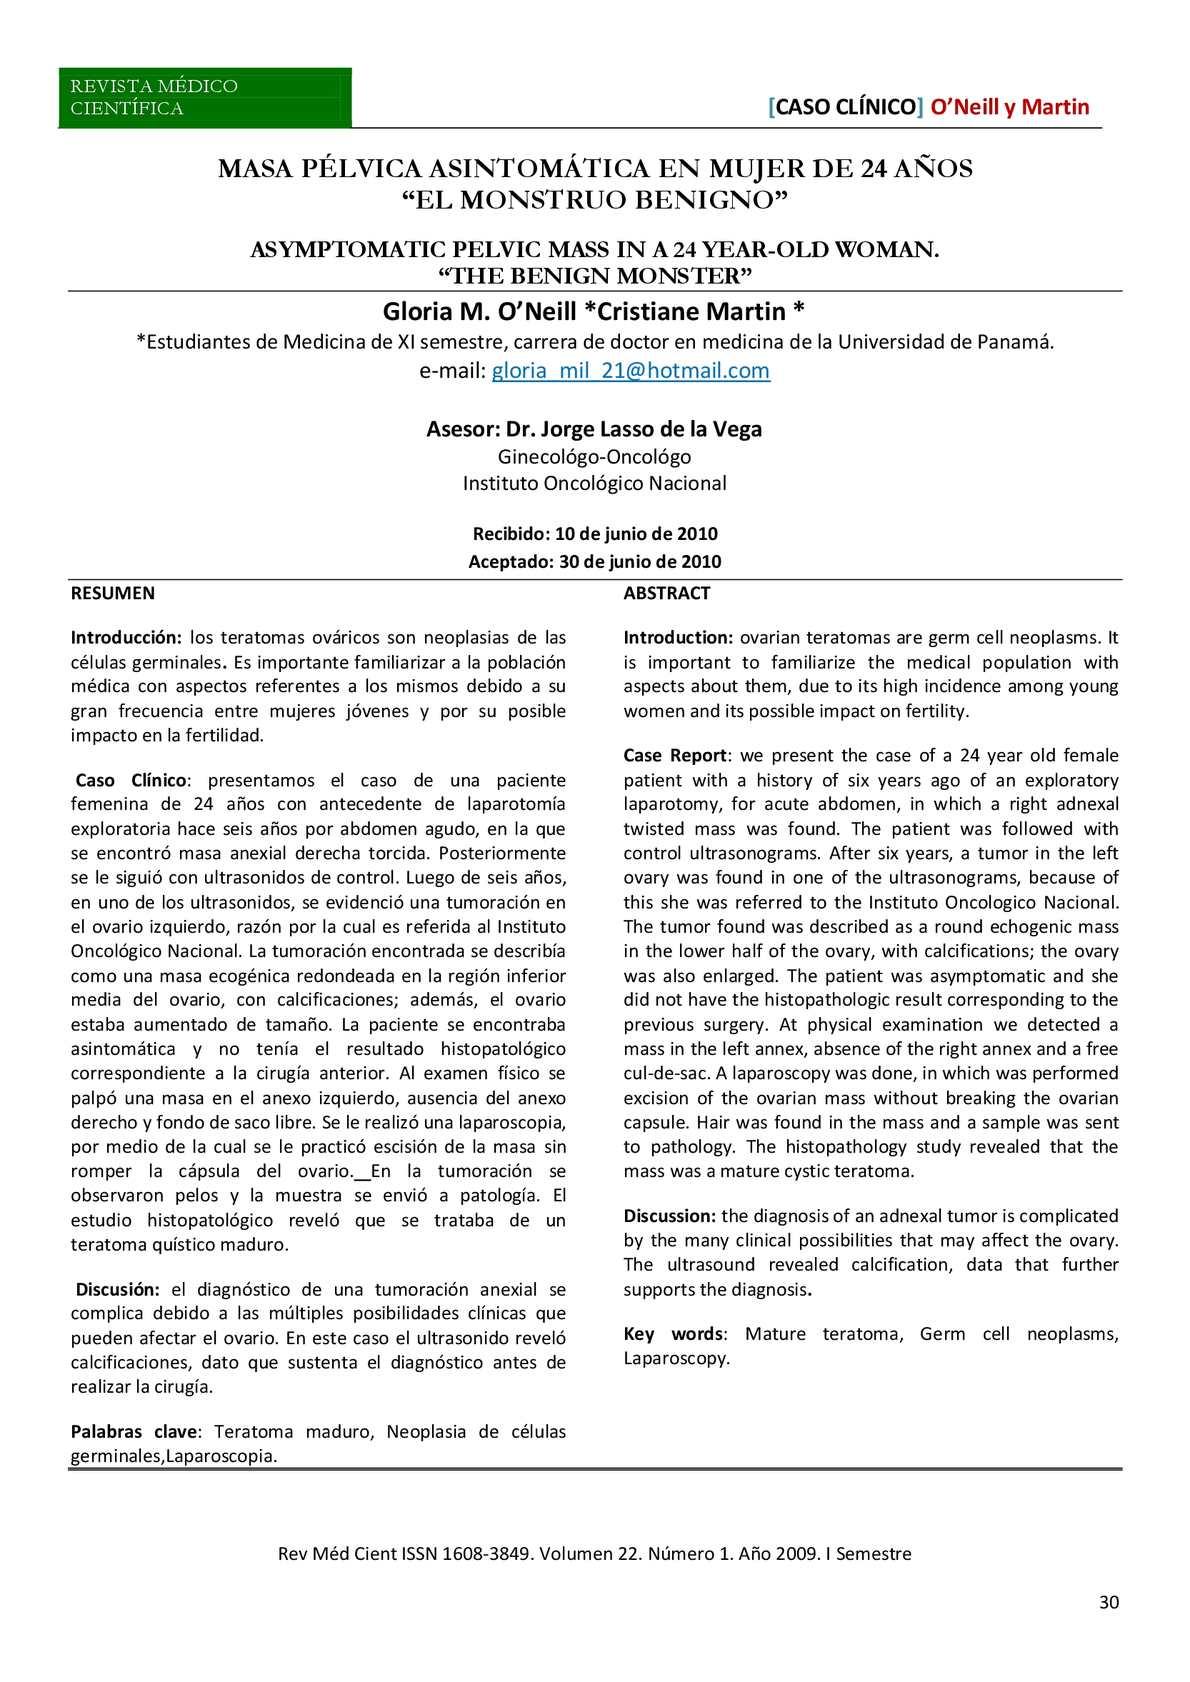 patogénesis tumoral sacrococcígea de diabetes